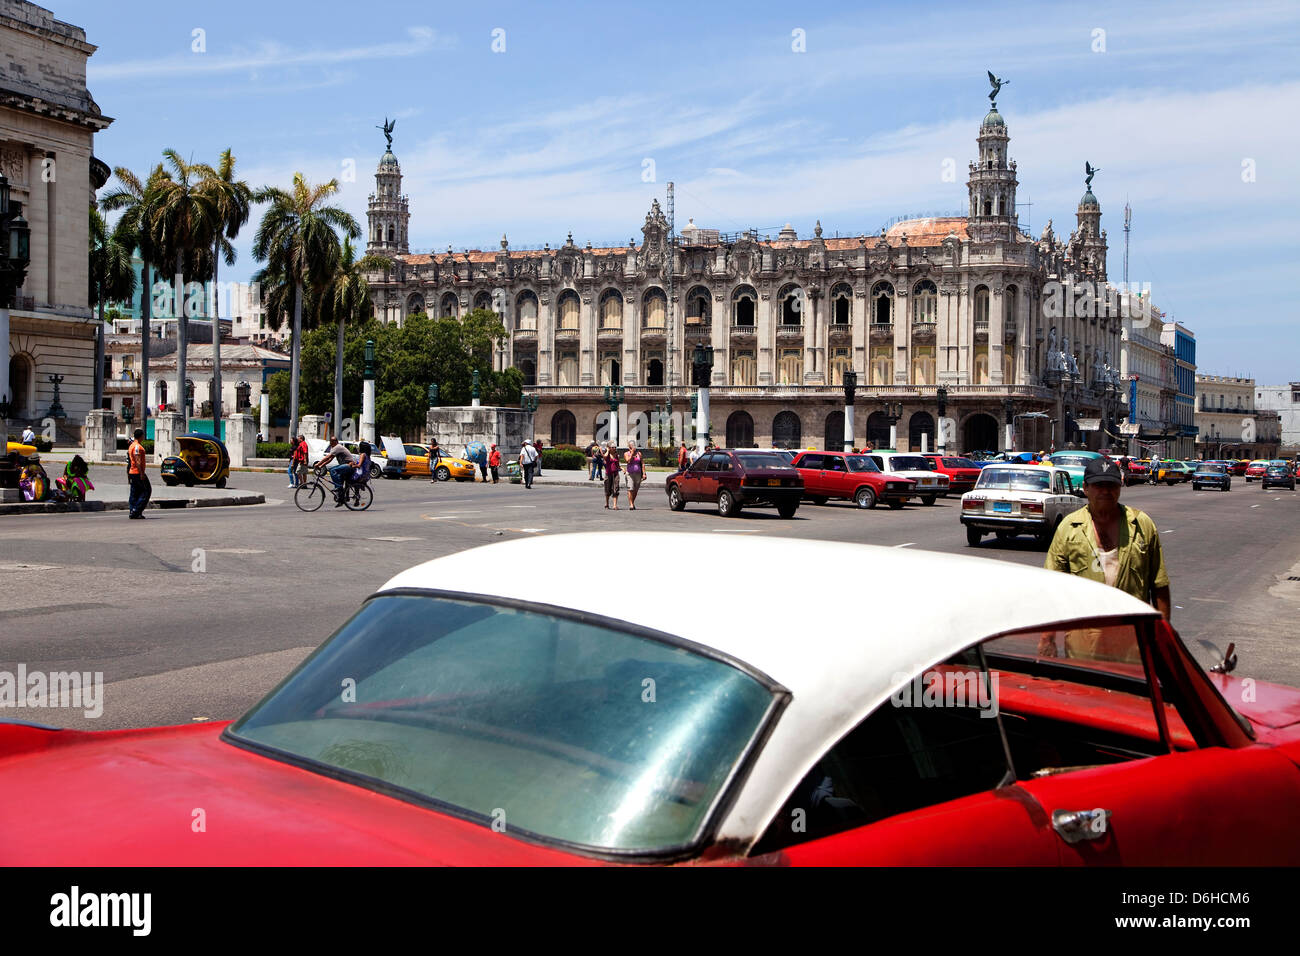 National Theater or Teatro Nacional with cars in traffic, Cuban city of Havana, La Habana, Cuba, South America, - Stock Image